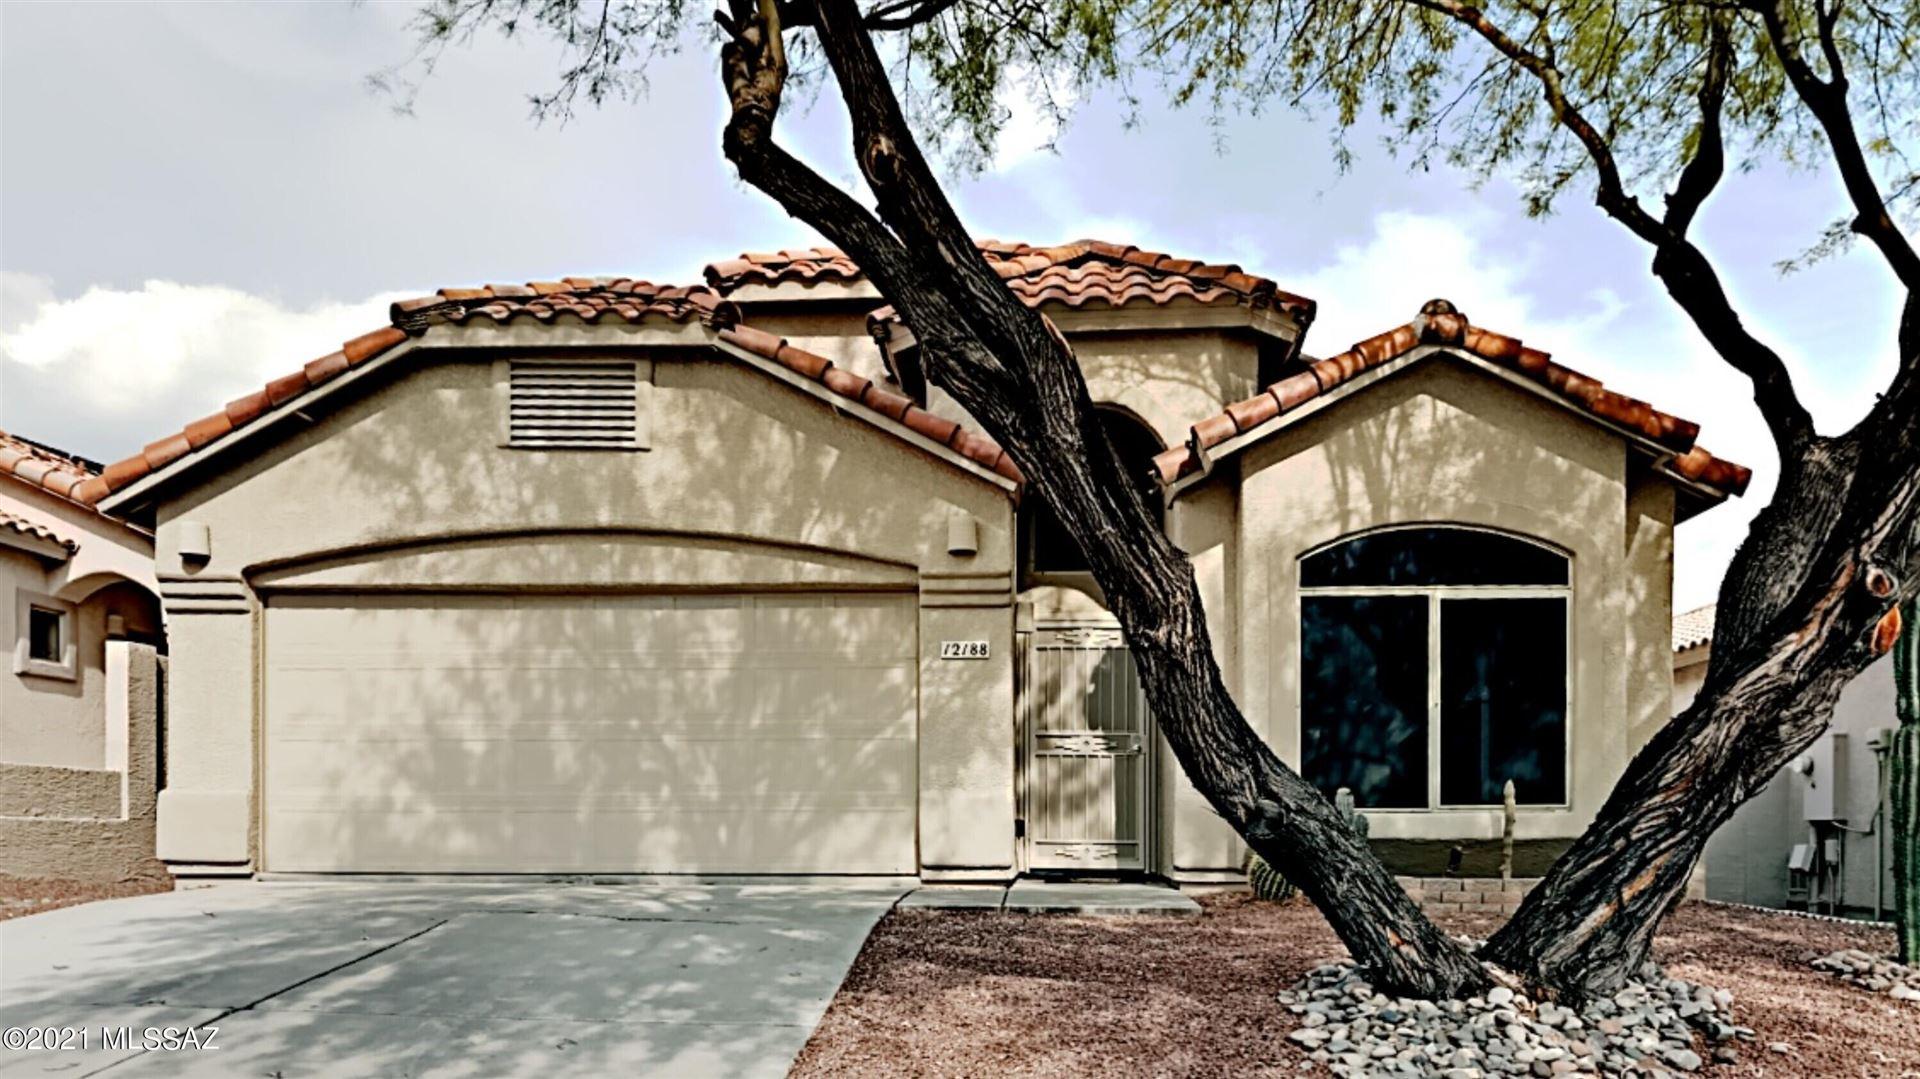 12188 N Kylene Canyon Drive, Oro Valley, AZ 85755 - MLS#: 22118555